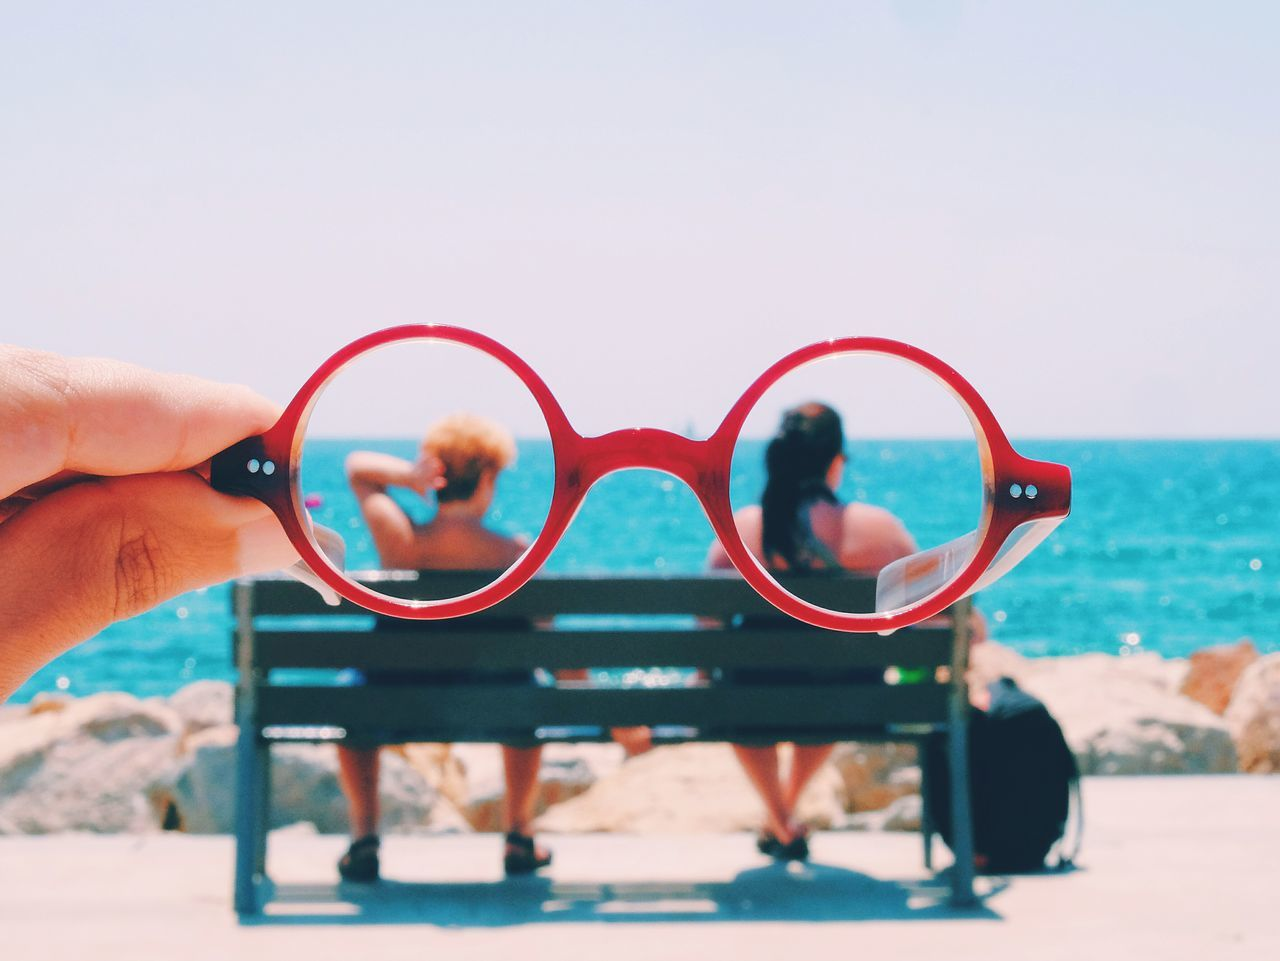 Couple sitting on bench on beach seen through eyeglasses